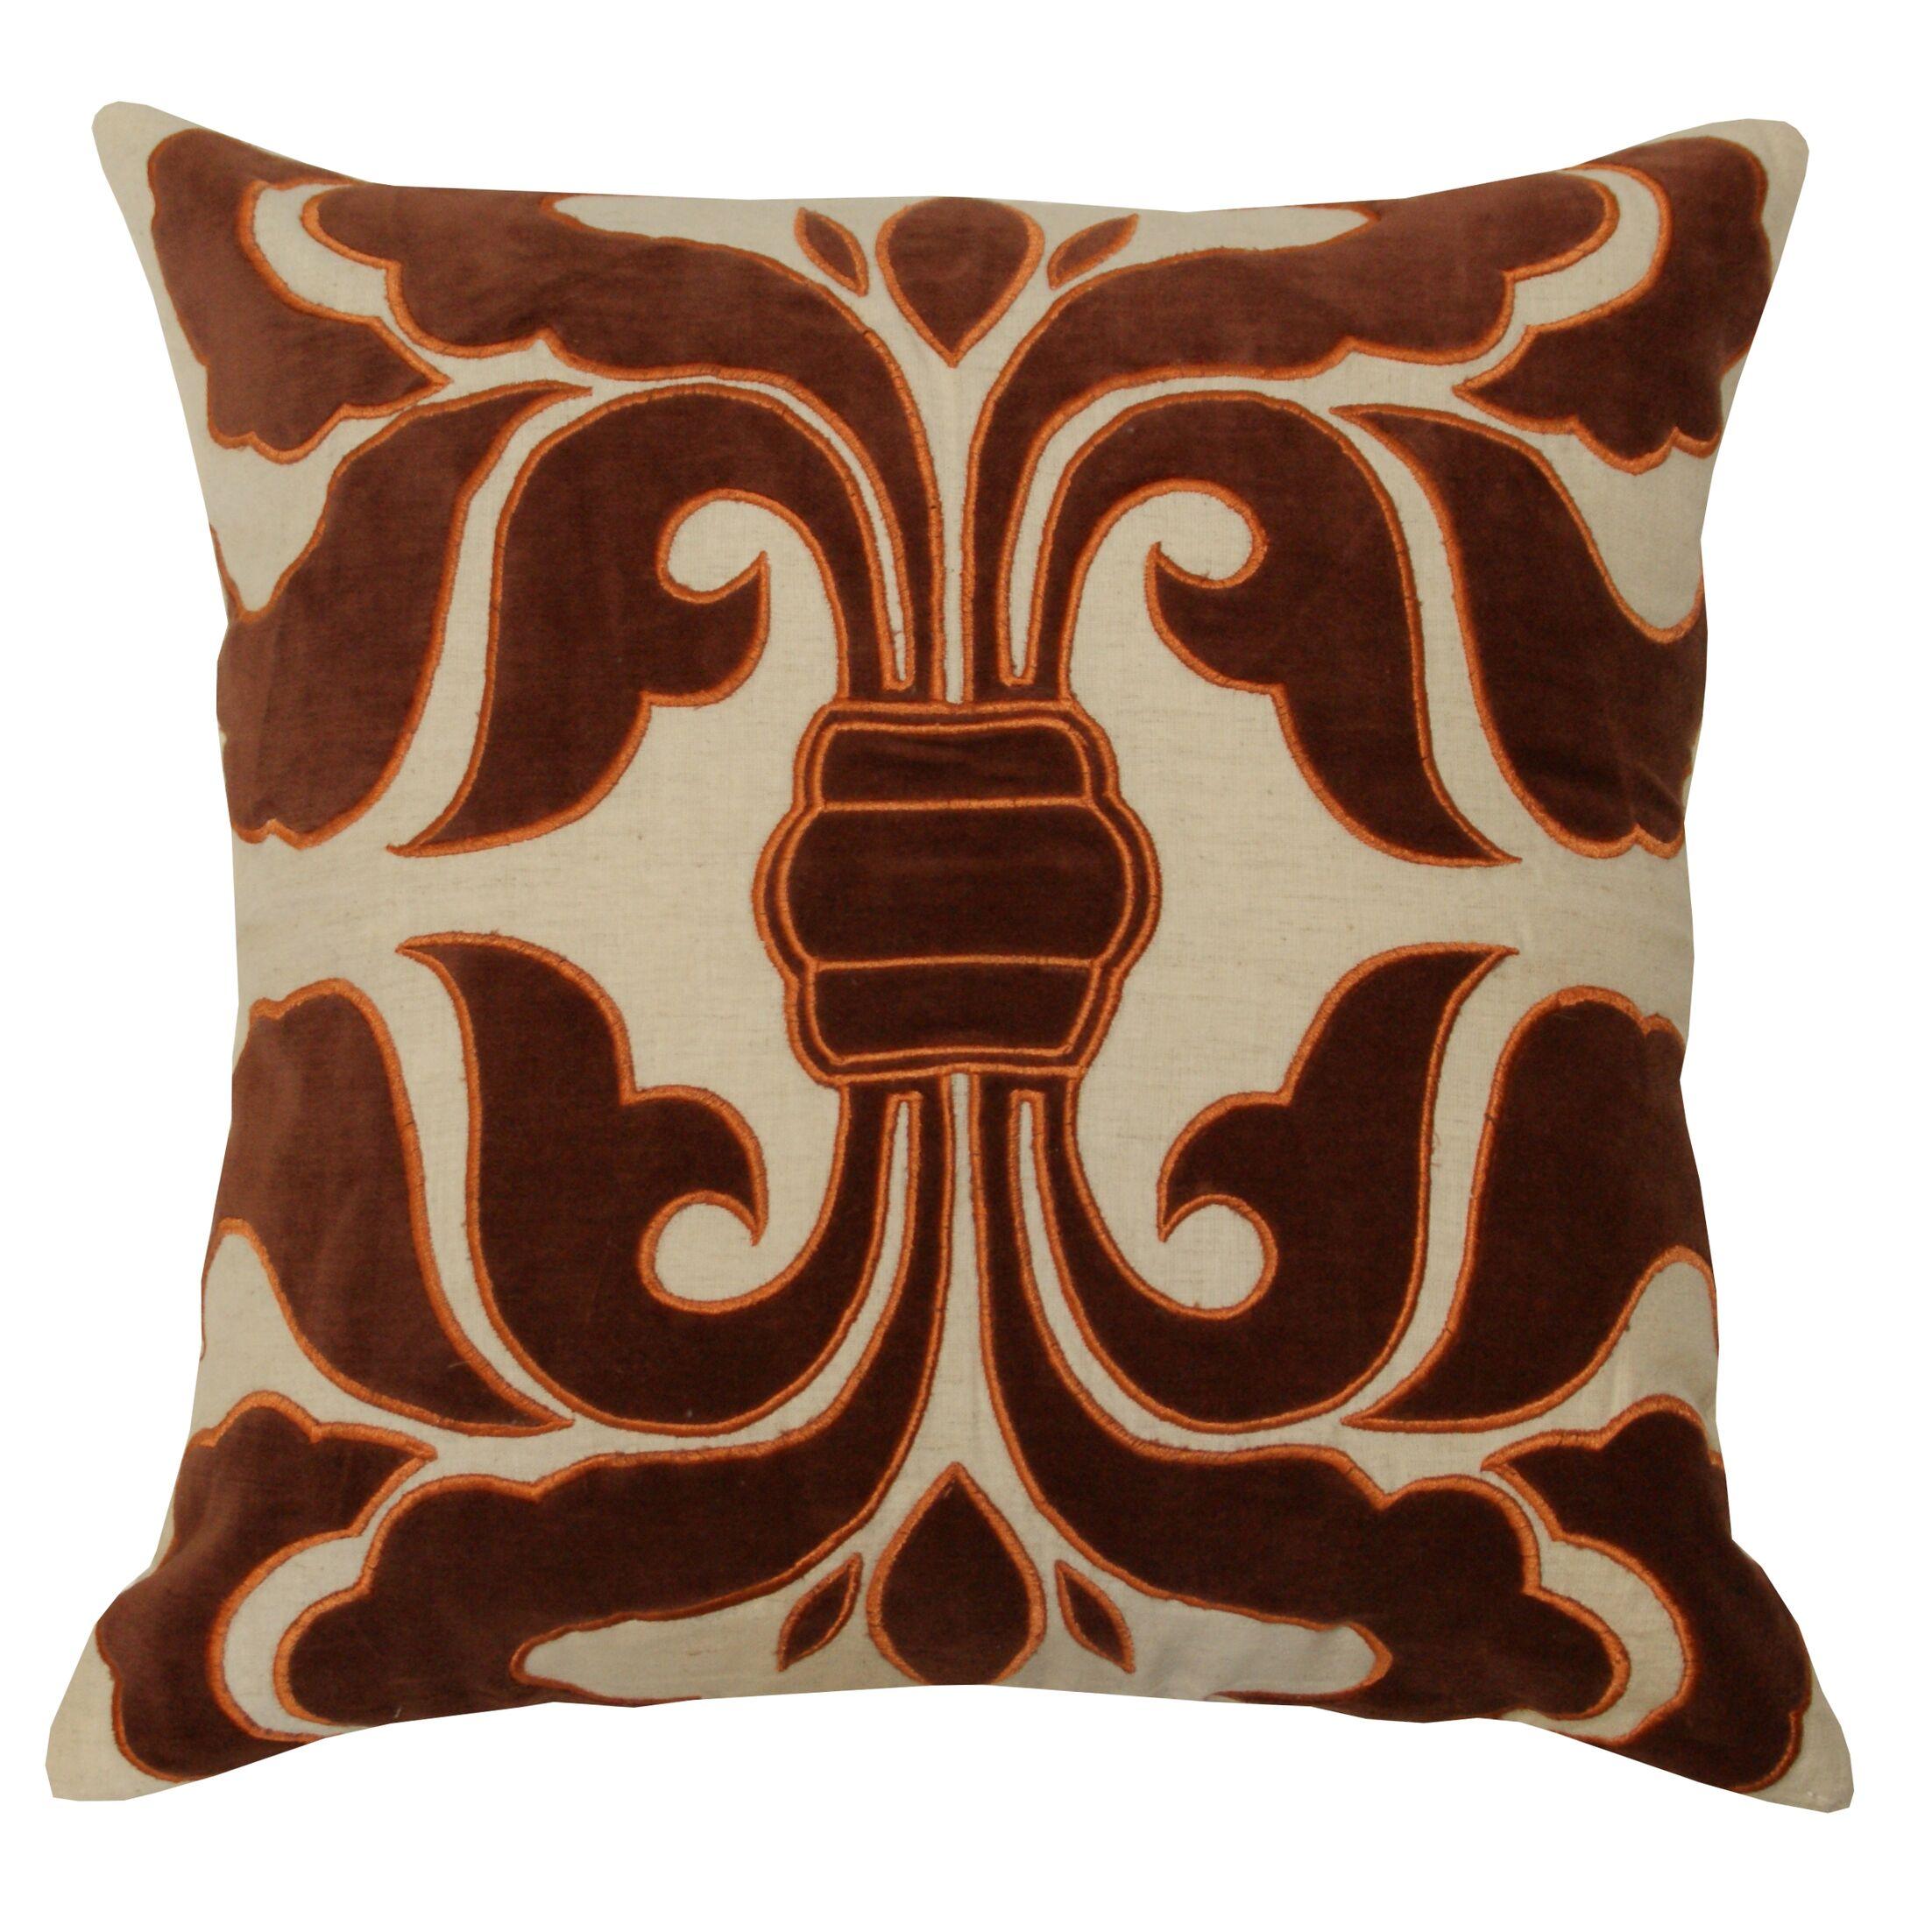 Applique Trellis Cotton Throw Pillow